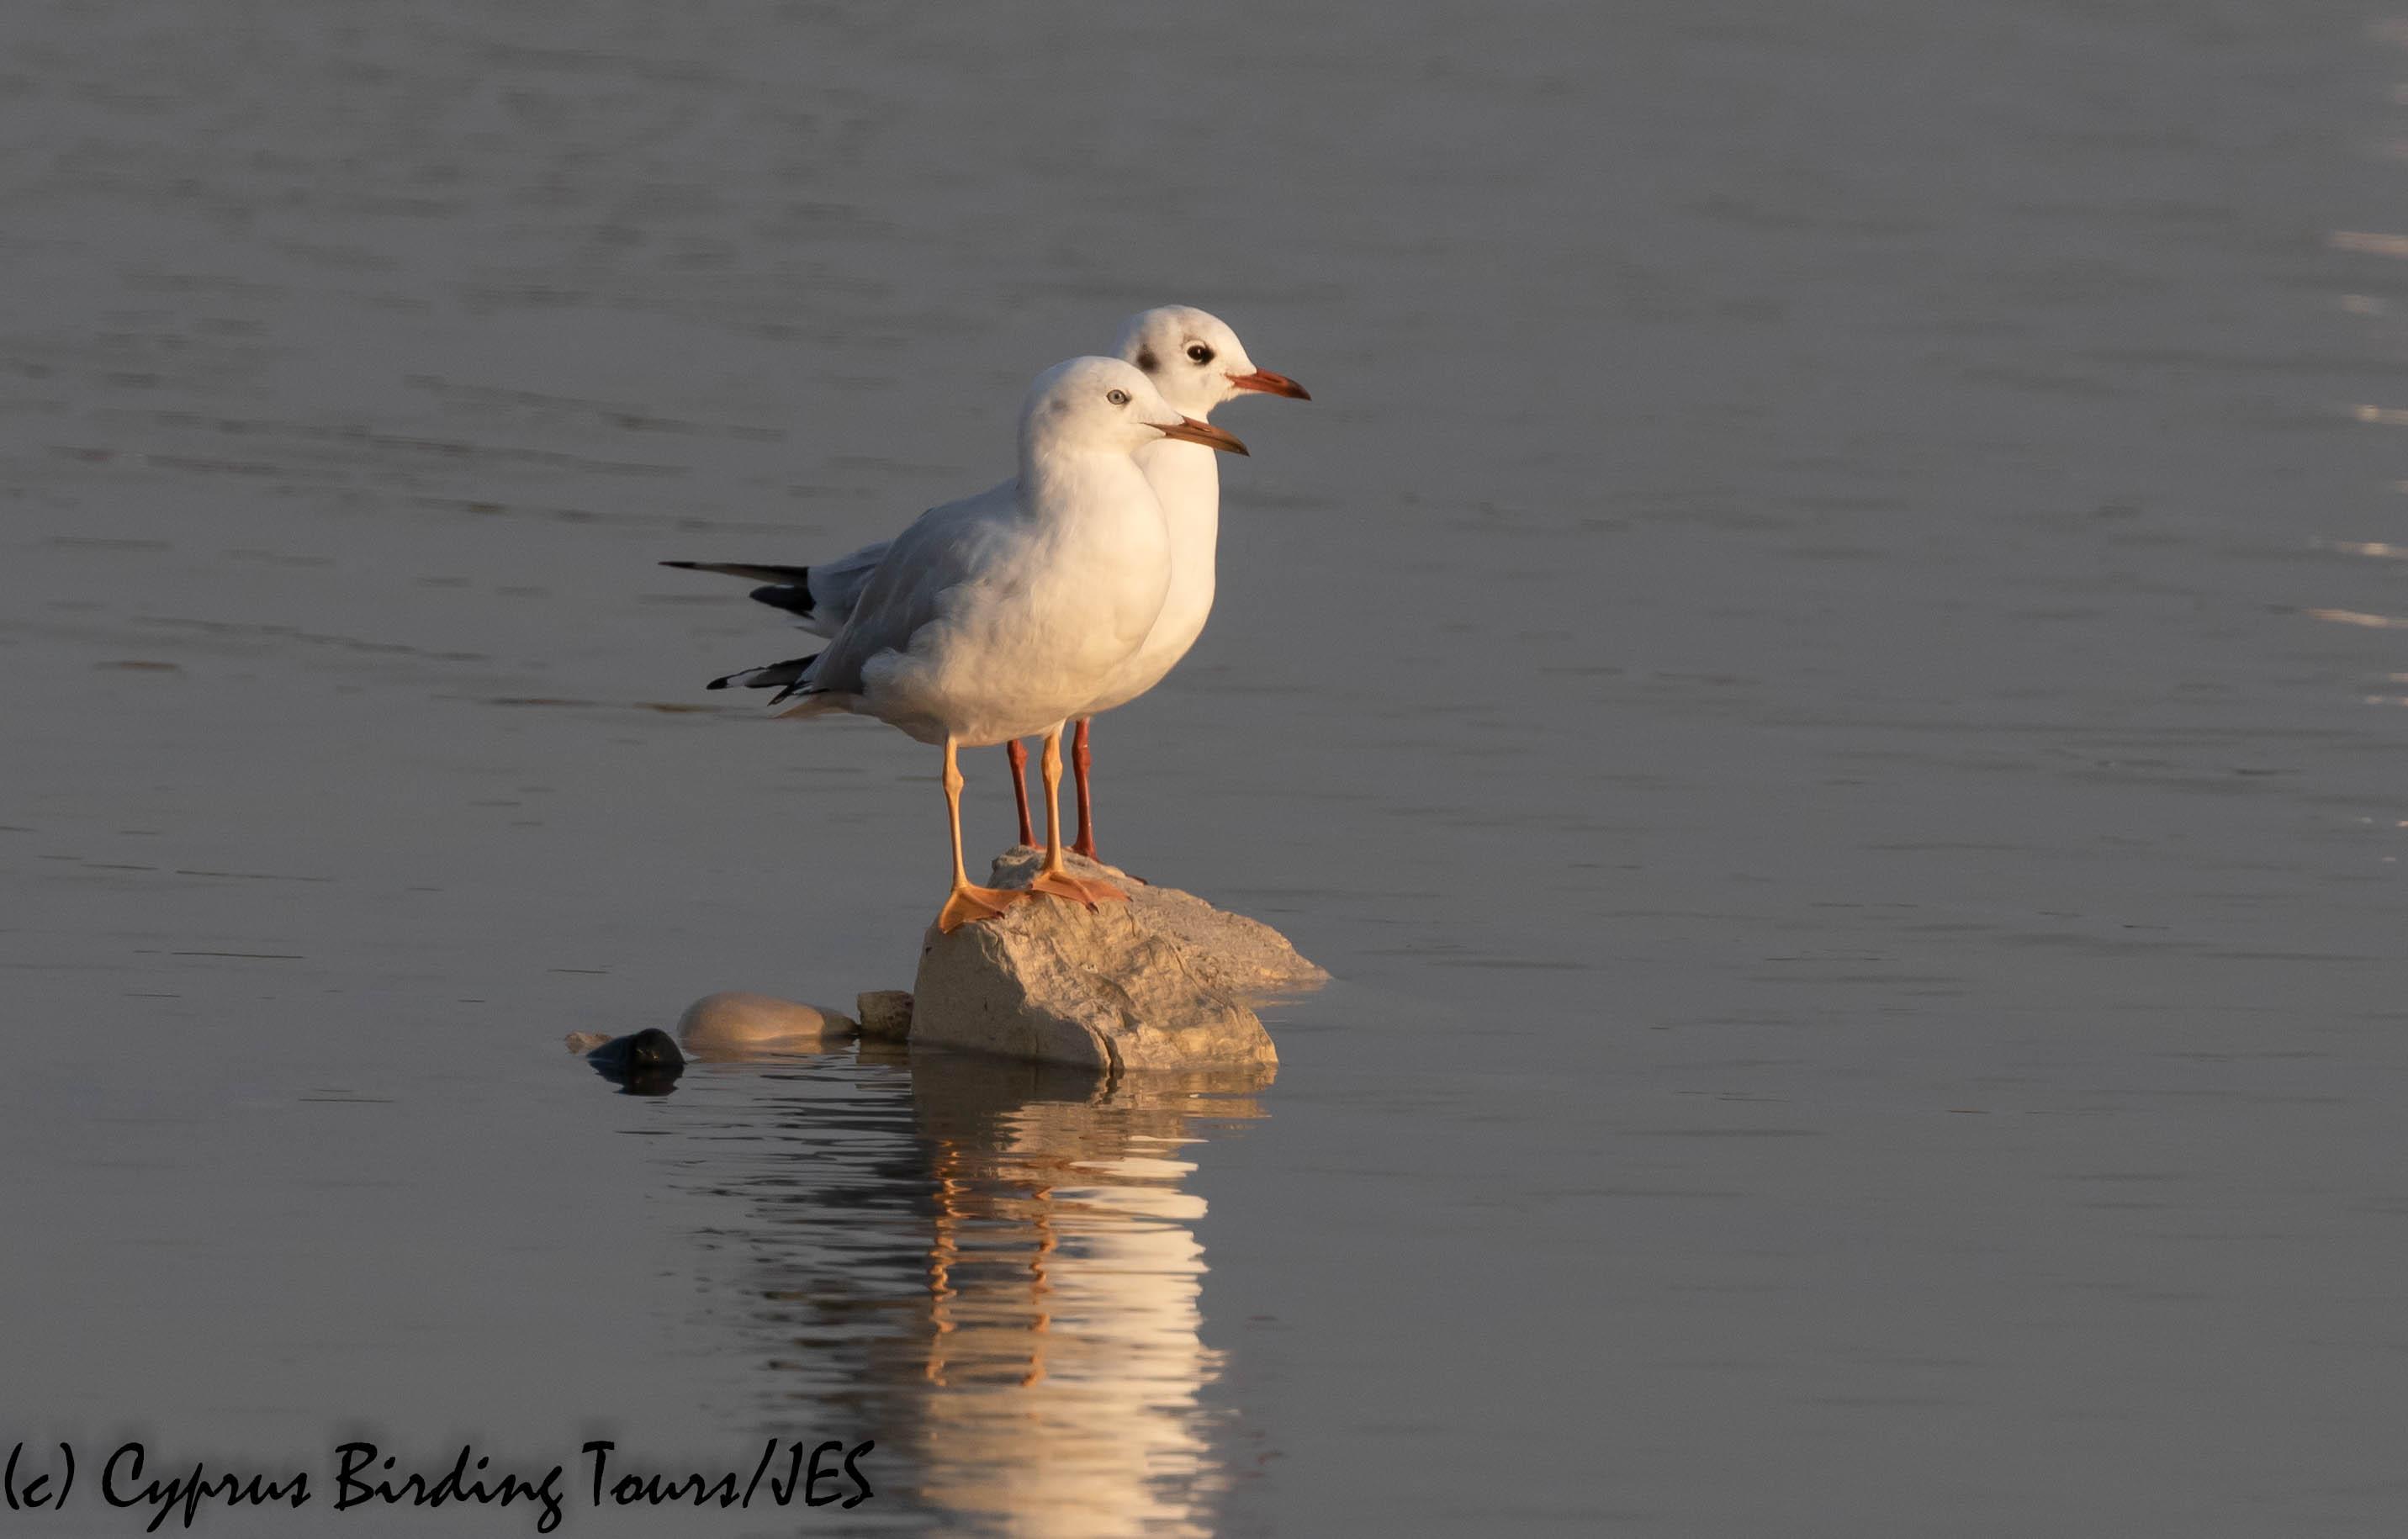 Slender-billed Gull, Lady's Mile, 22nd November 2019 (c) Cyprus Birding Tours